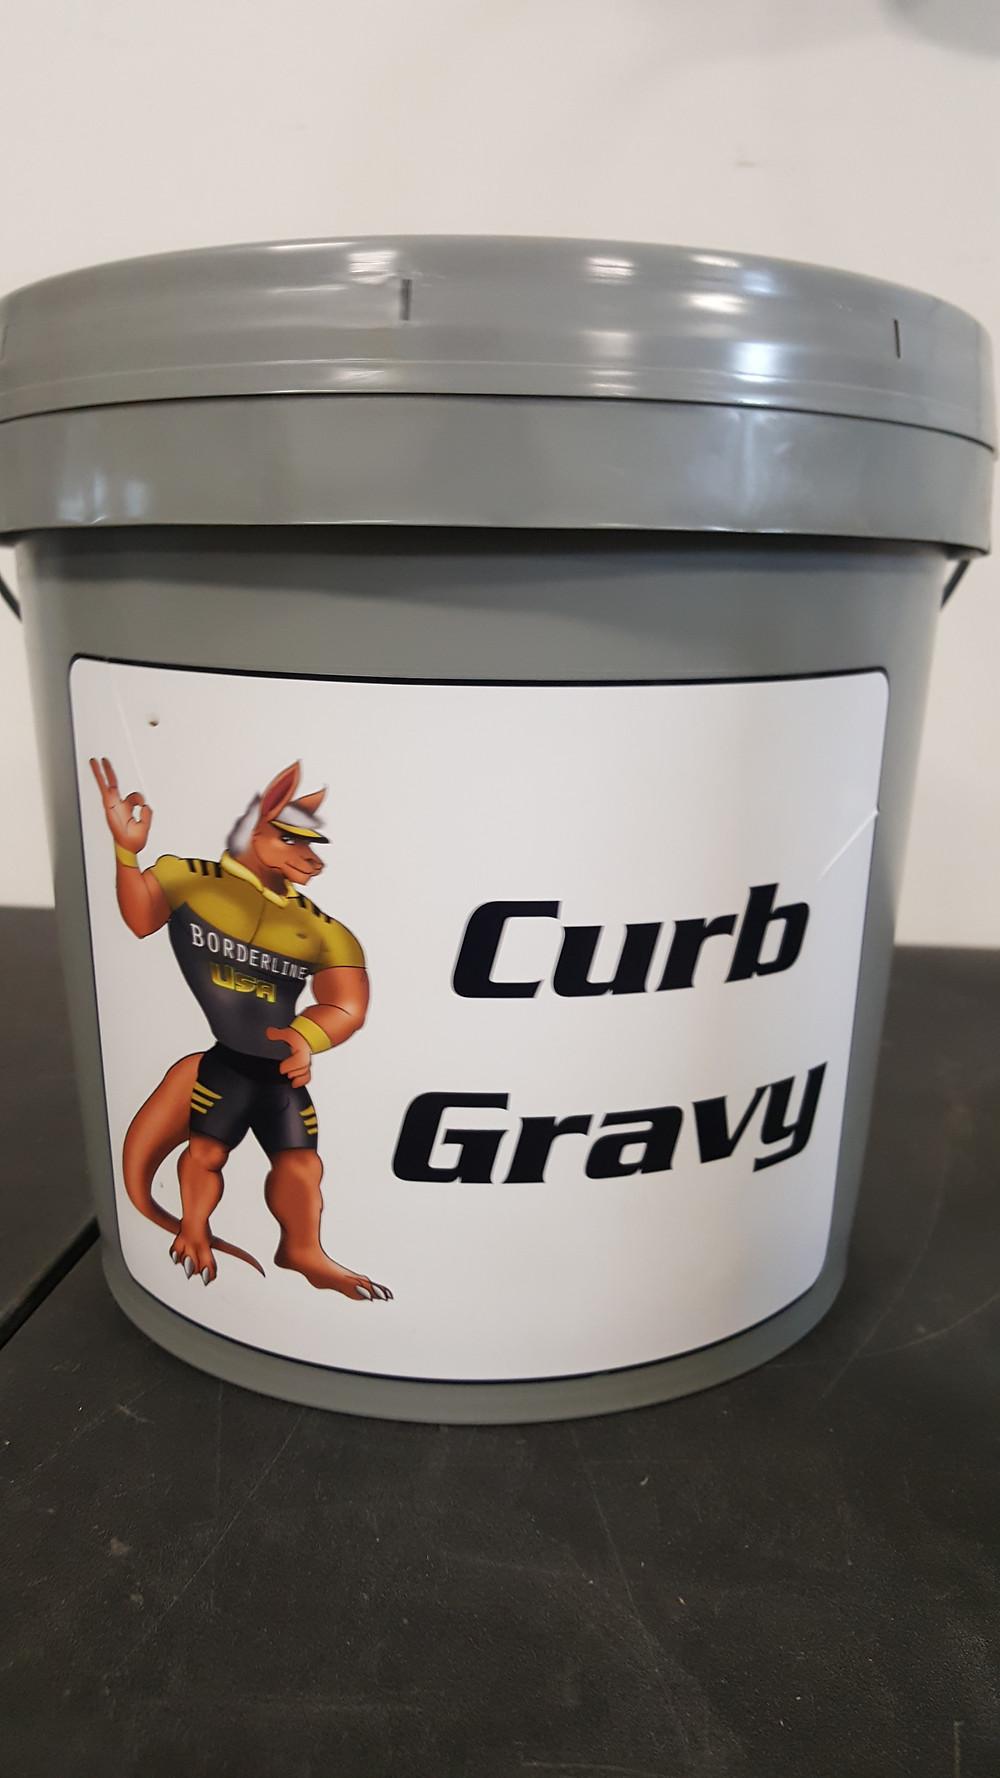 Curb Gravy - Borderline USA